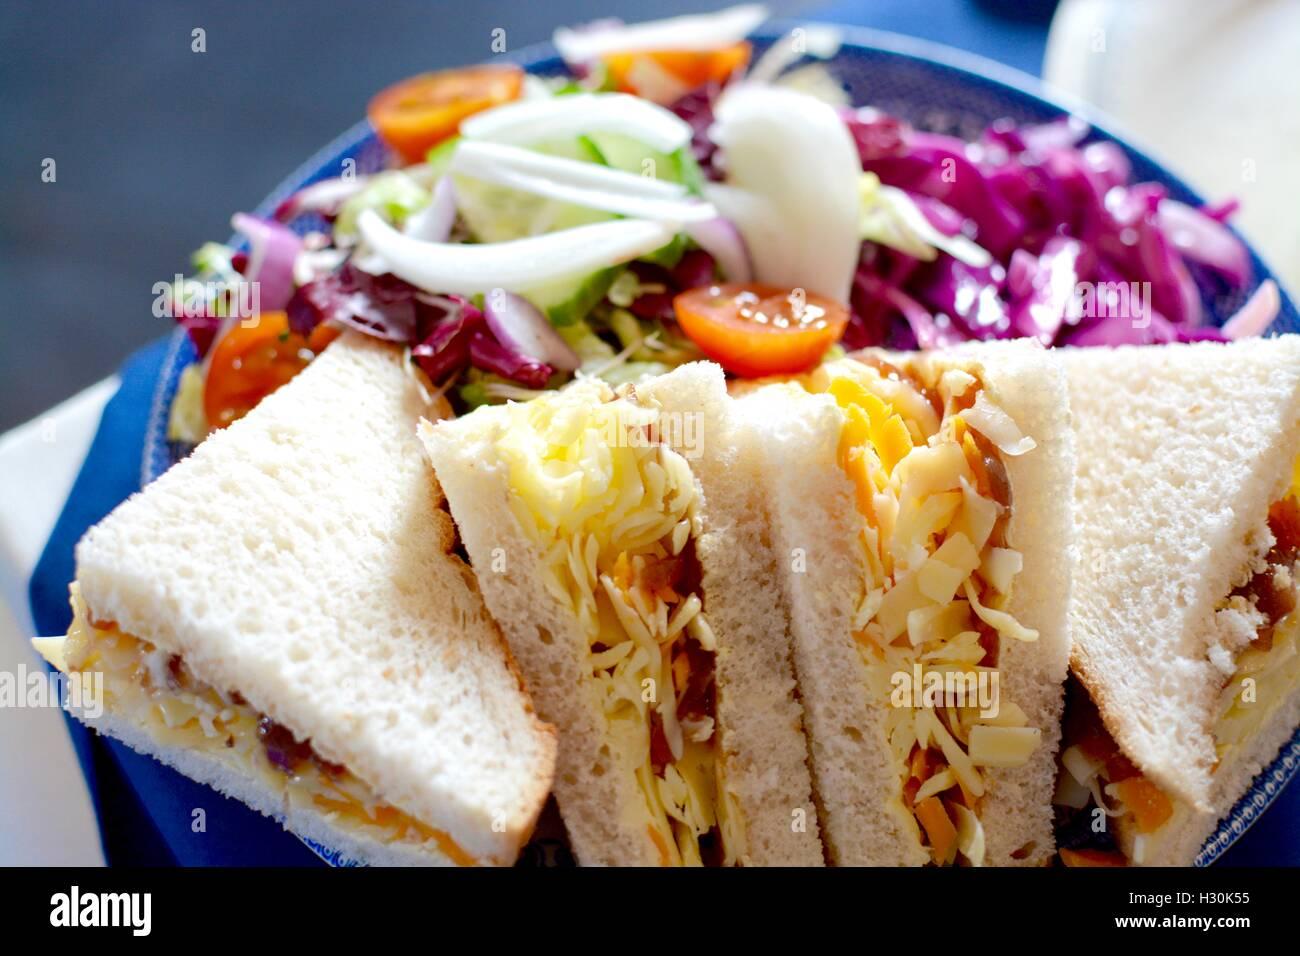 Cheese Sandwich - Stock Image